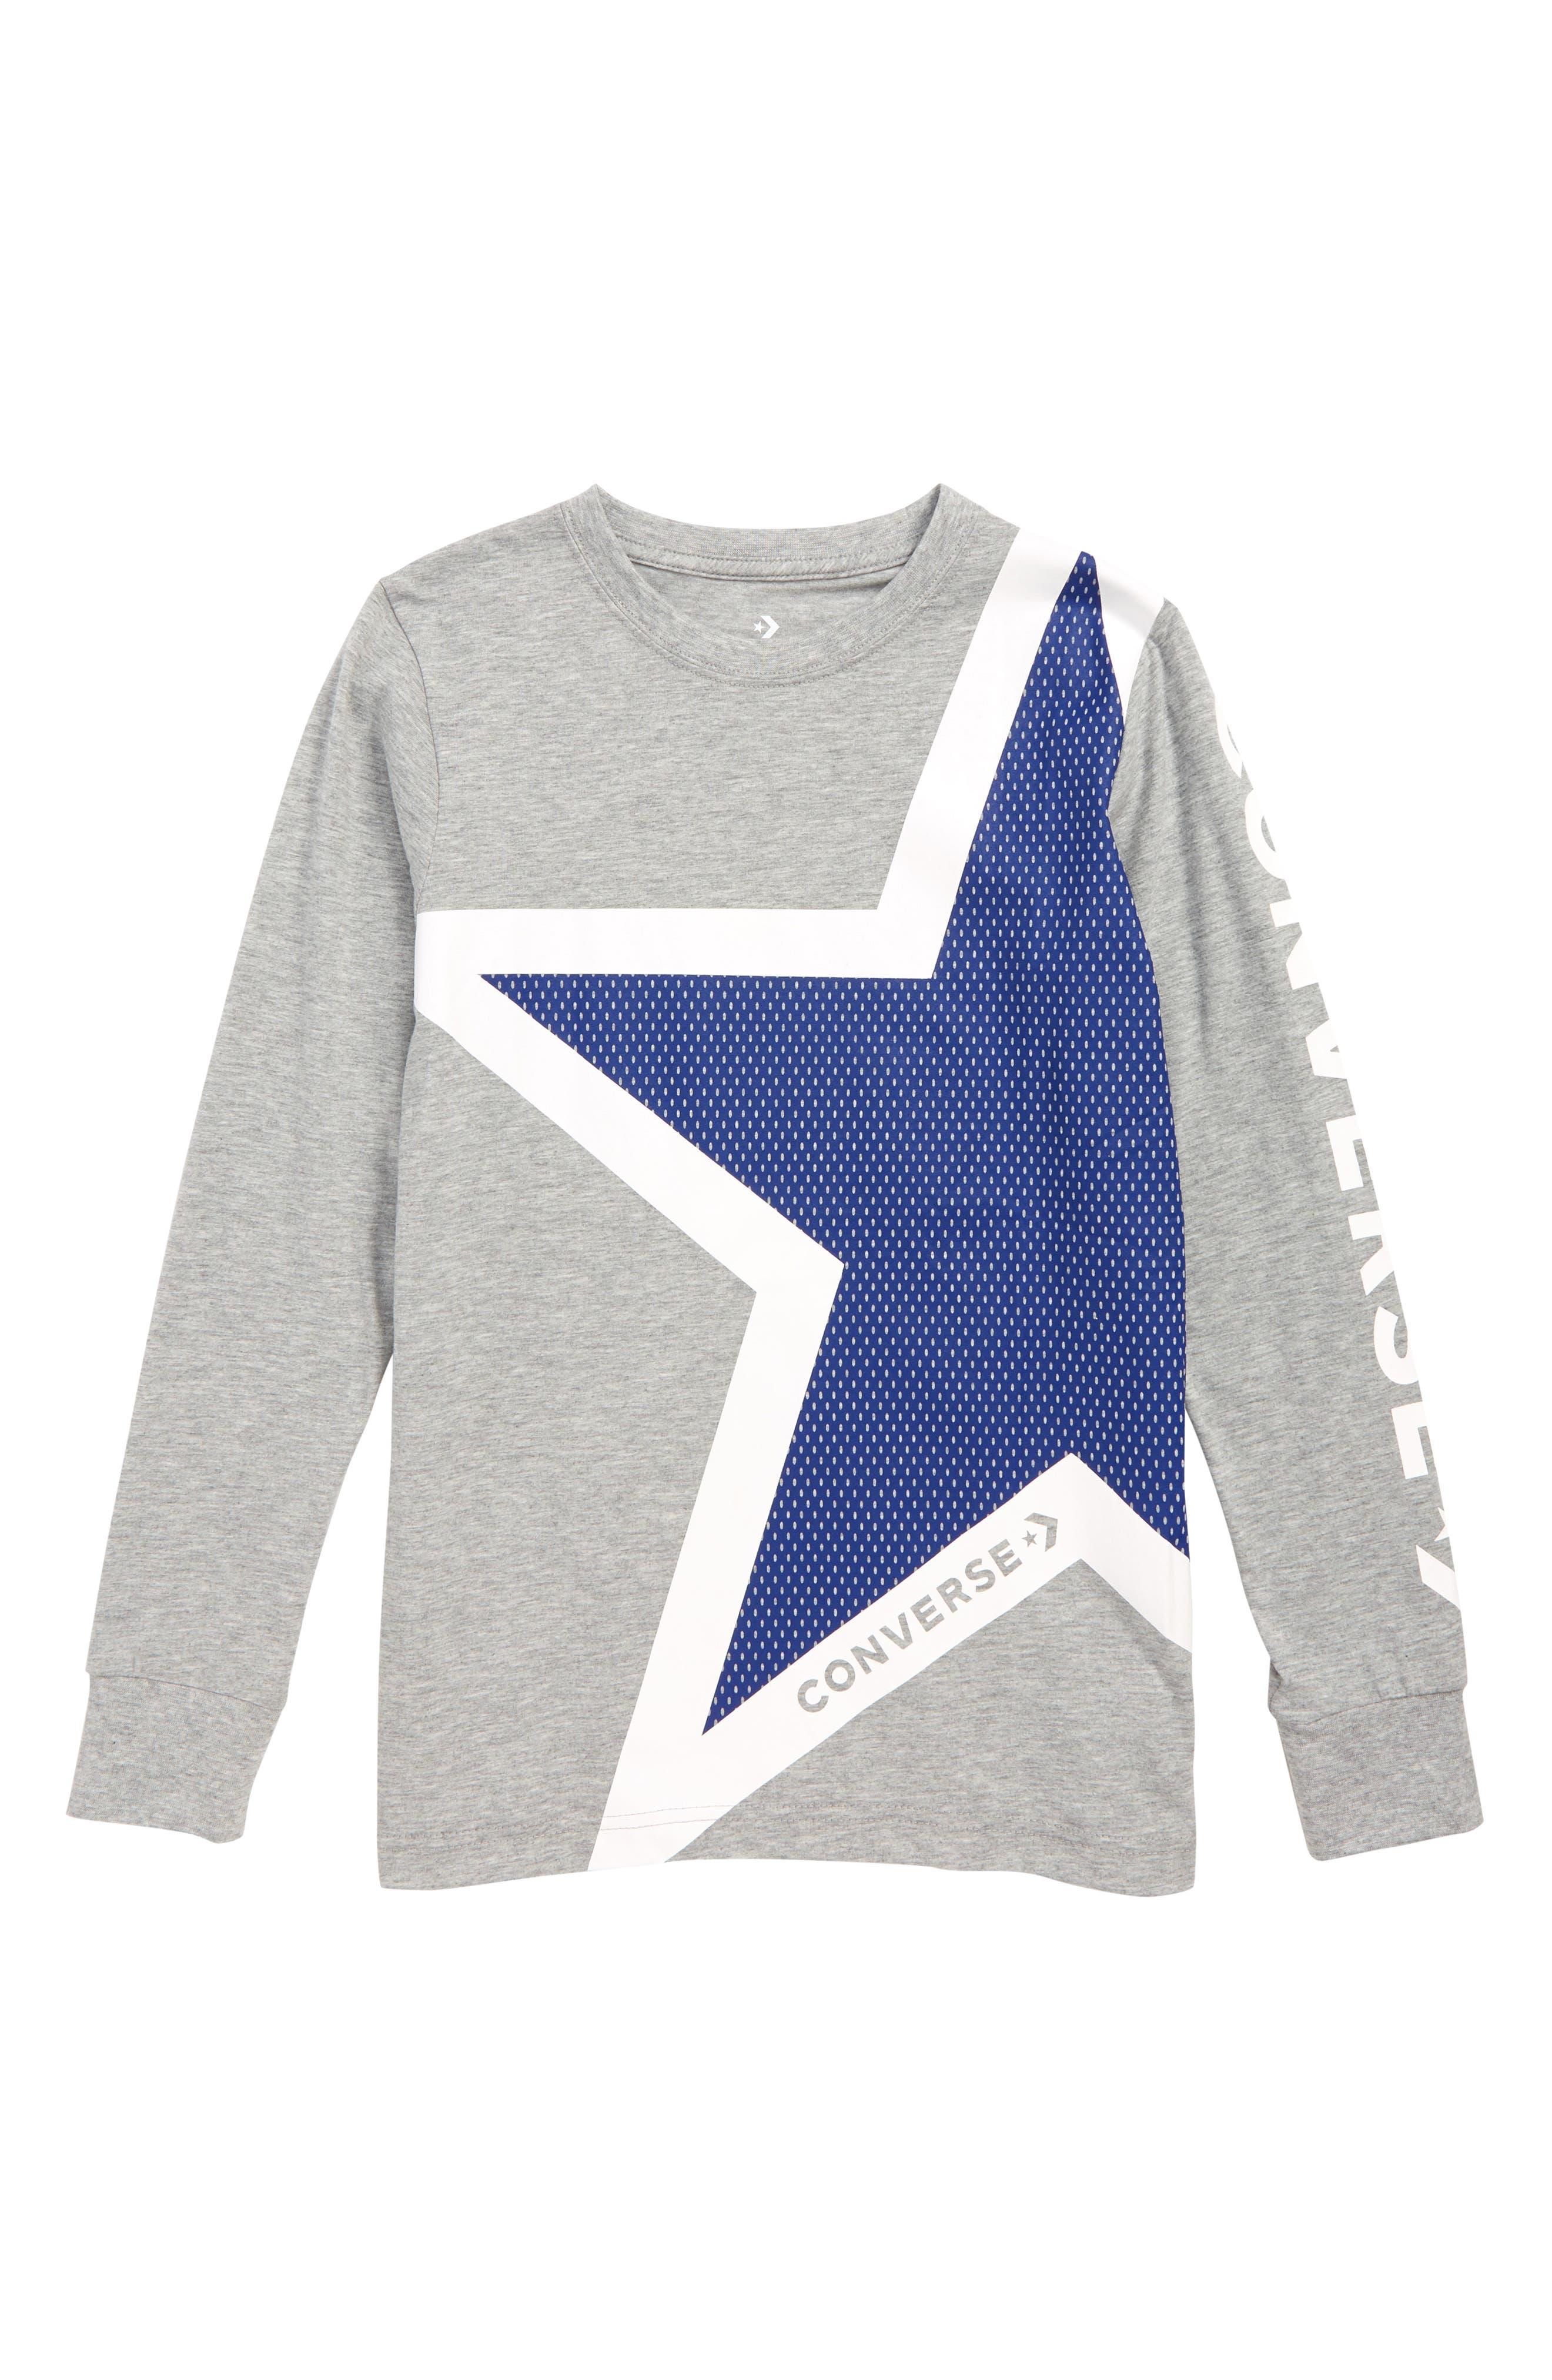 CONVERSE, One Star T-Shirt, Main thumbnail 1, color, DARK GREY HEATHER